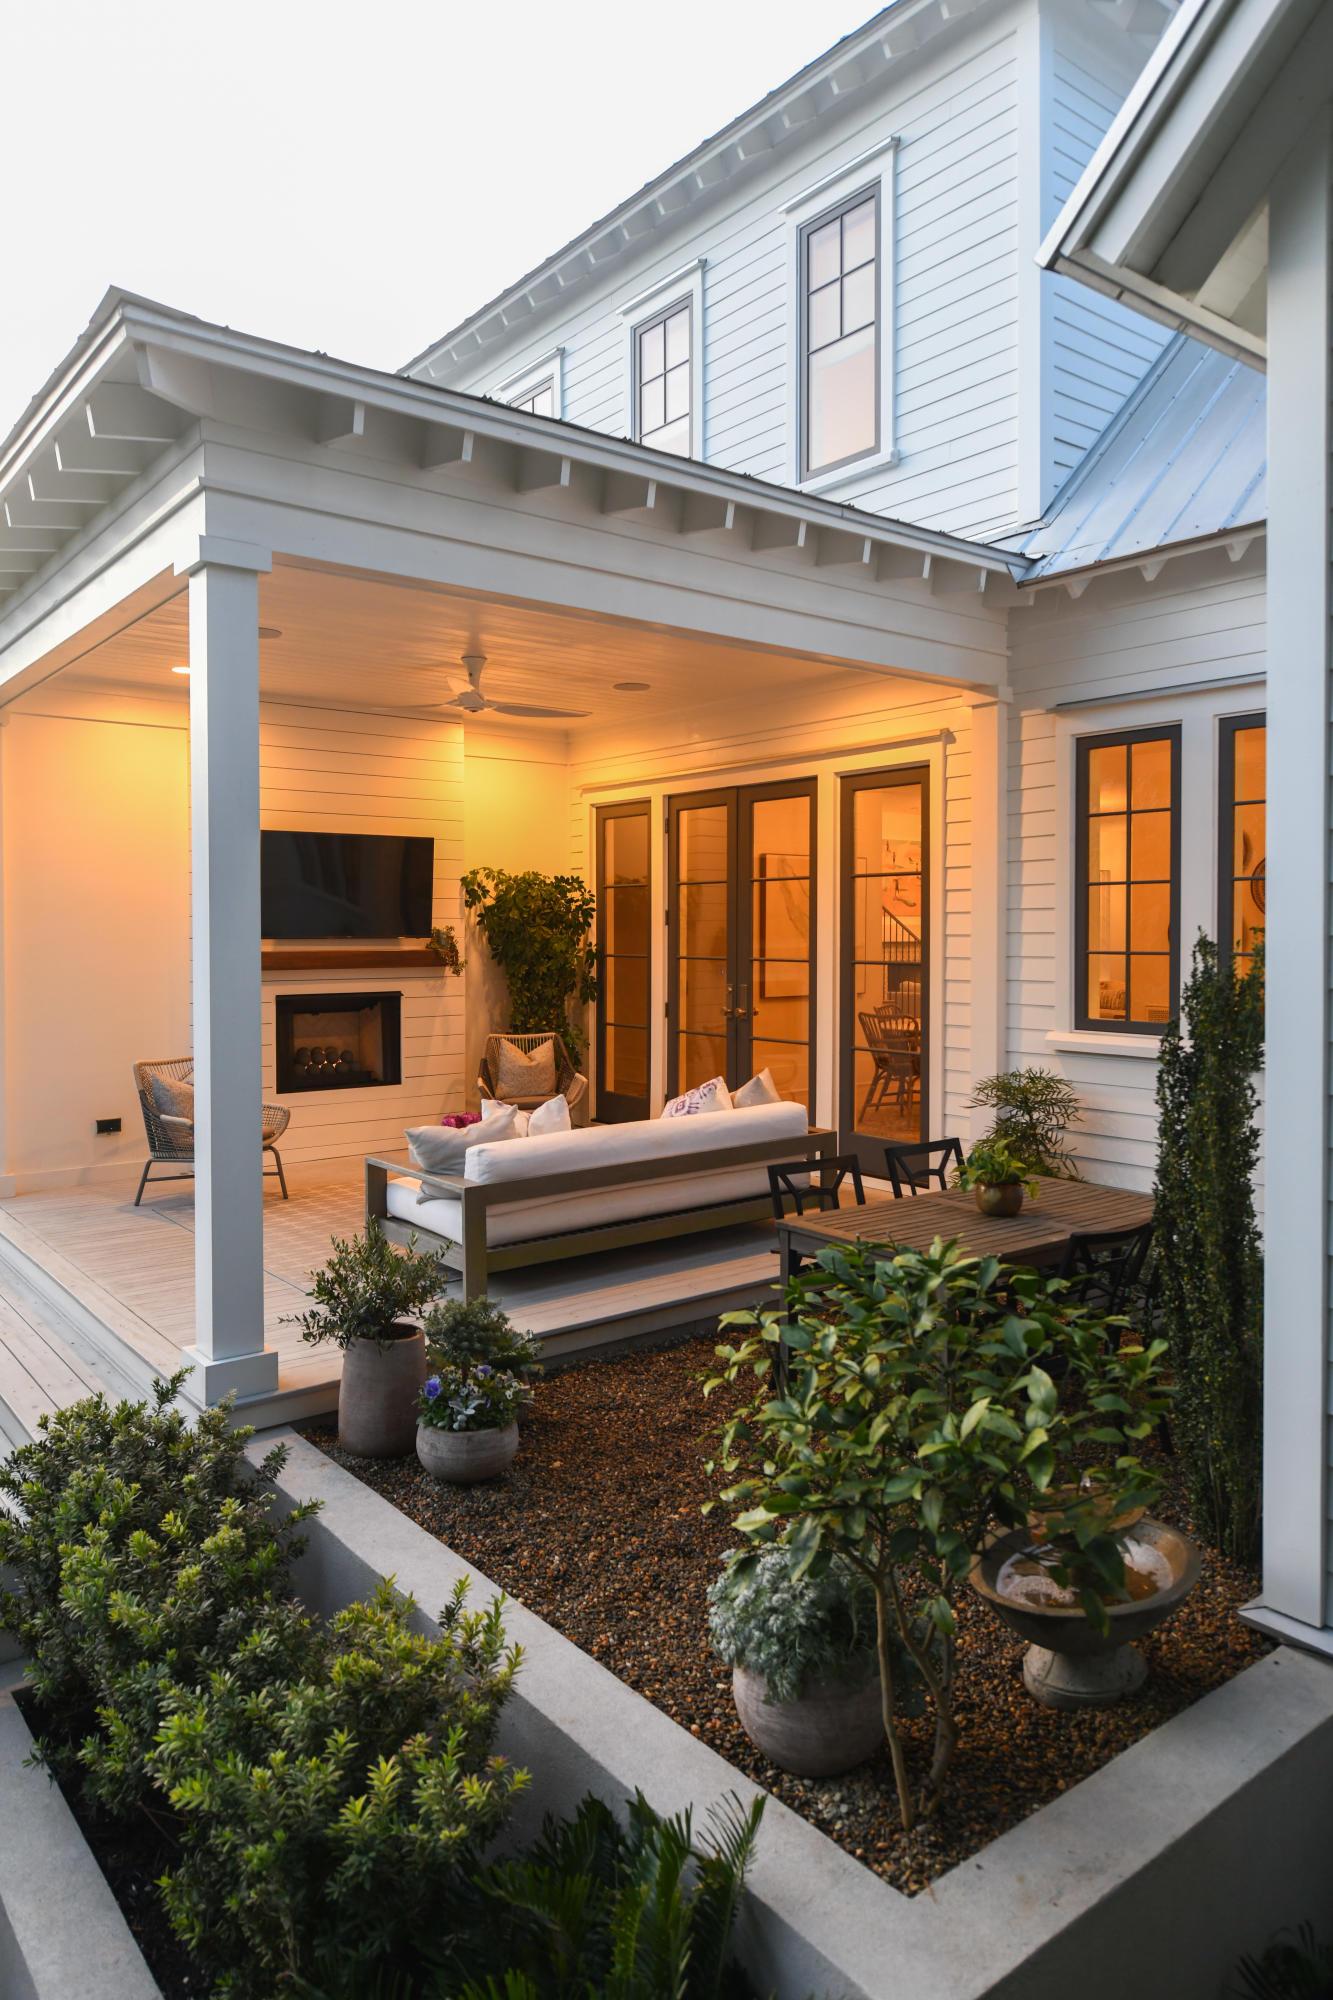 Old Mt Pleasant Homes For Sale - 745 Winthrop, Mount Pleasant, SC - 7